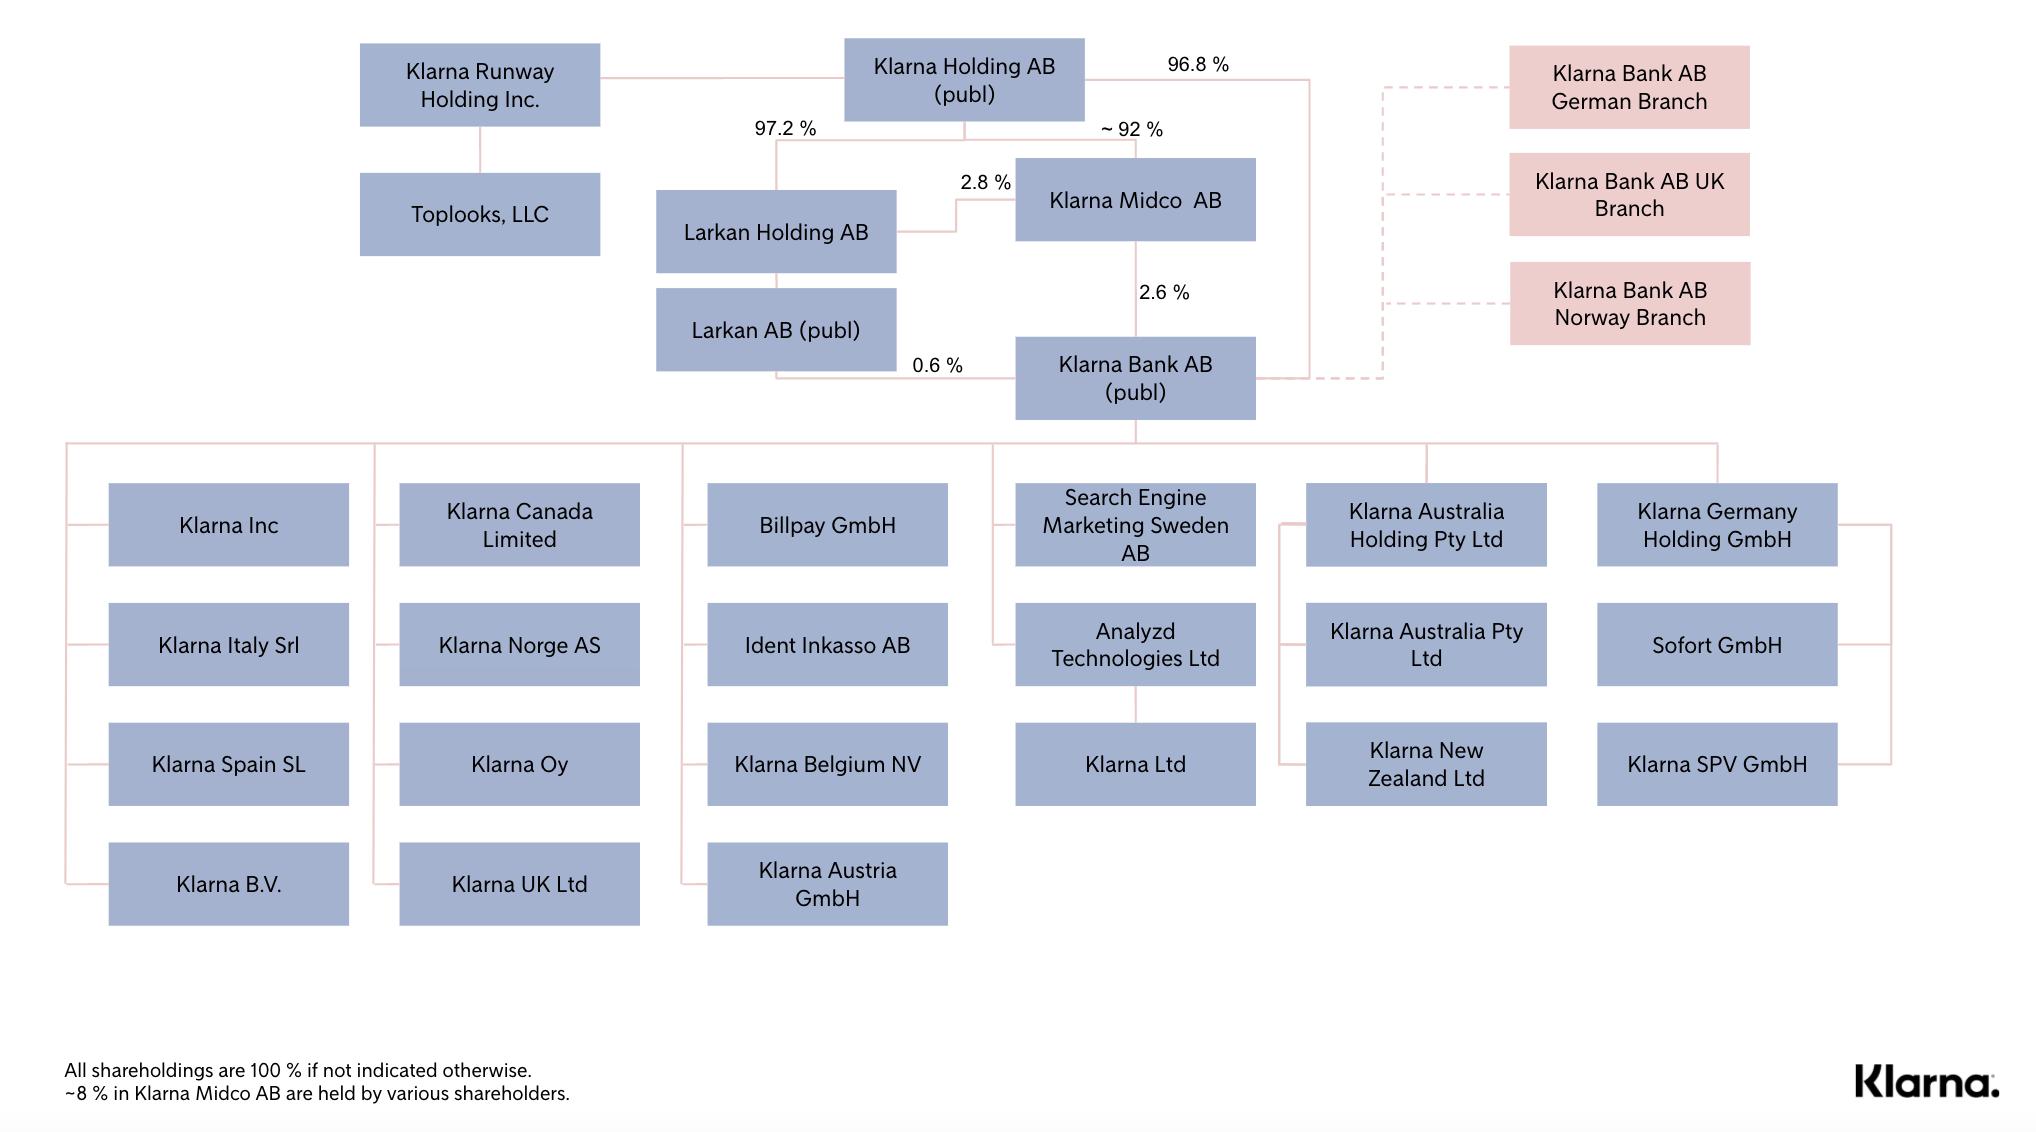 Klarna Legal Entity Chart - 22 Feb 2021